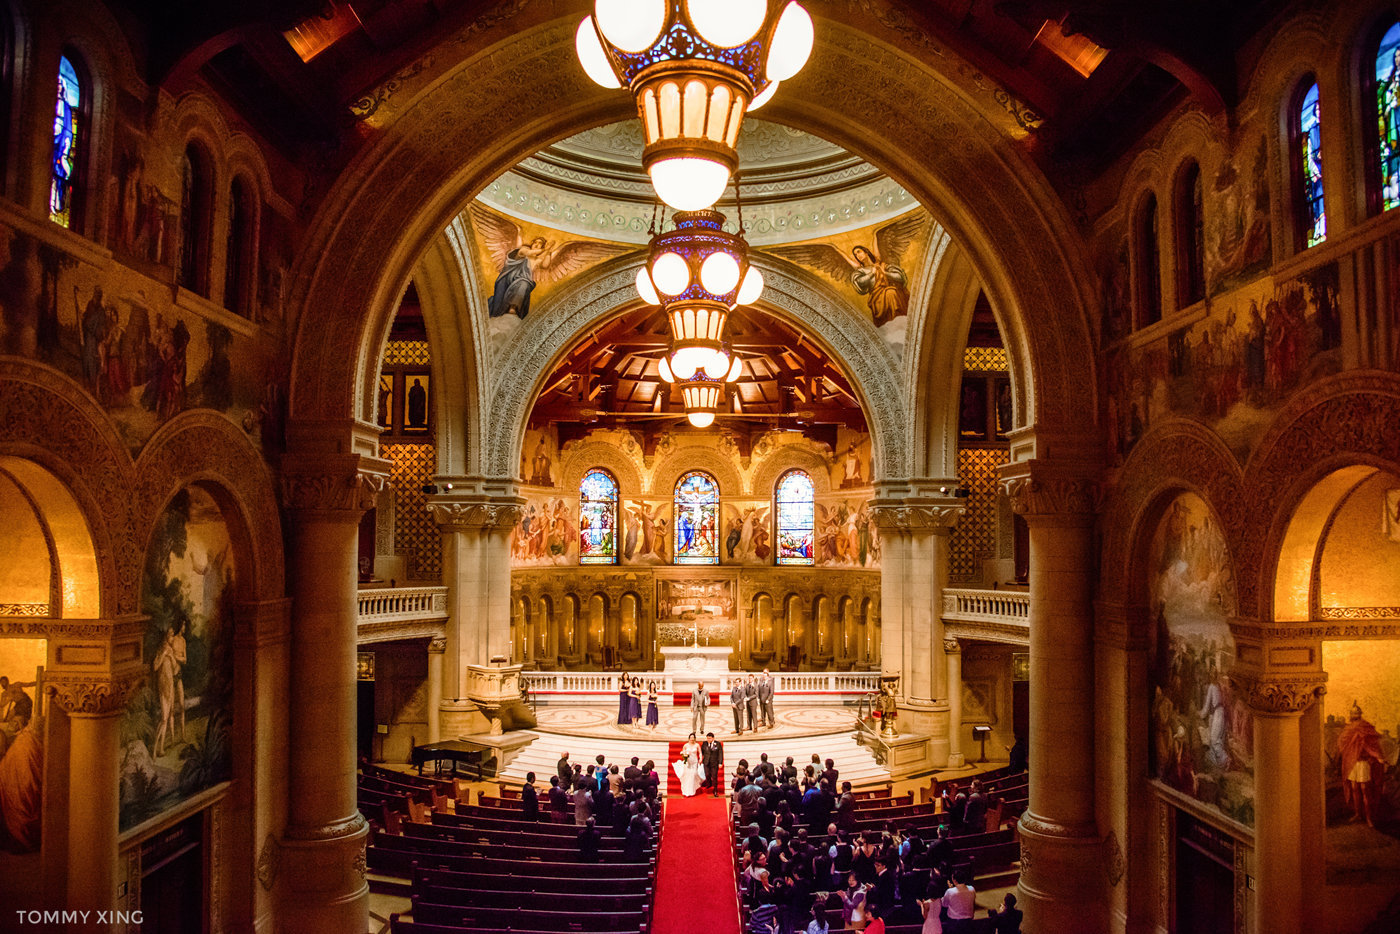 STANFORD MEMORIAL CHURCH WEDDING - Wenjie & Chengcheng - SAN FRANCISCO BAY AREA 斯坦福教堂婚礼跟拍 - 洛杉矶婚礼婚纱照摄影师 Tommy Xing Photography119.jpg